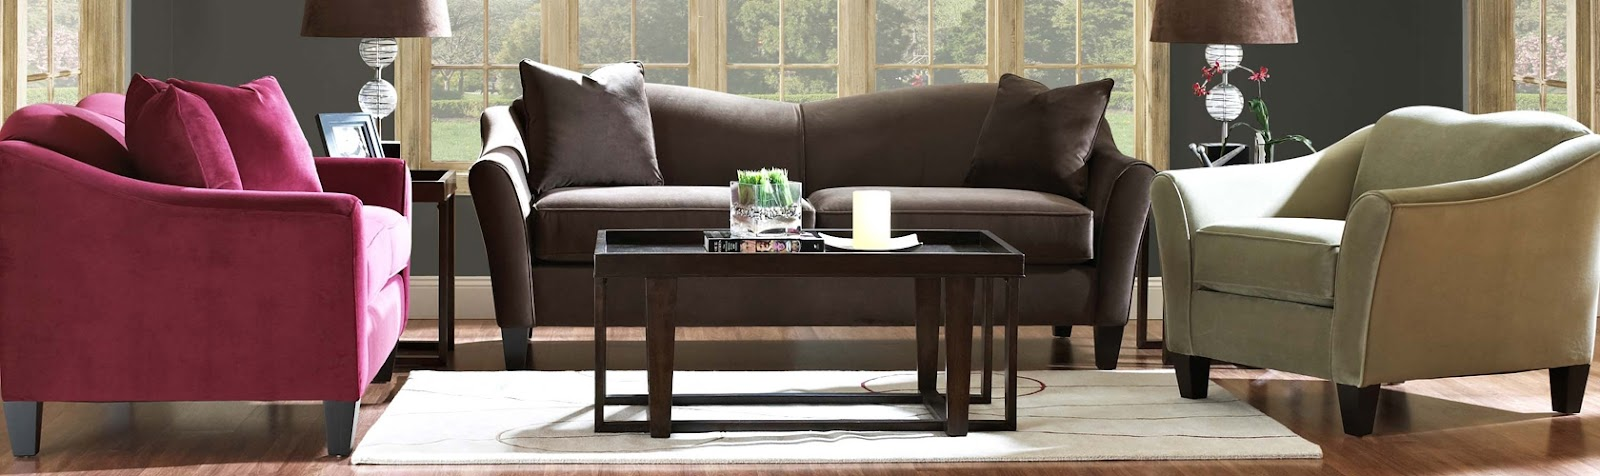 Nb Liebman Furniture Giveaway Decoration Access